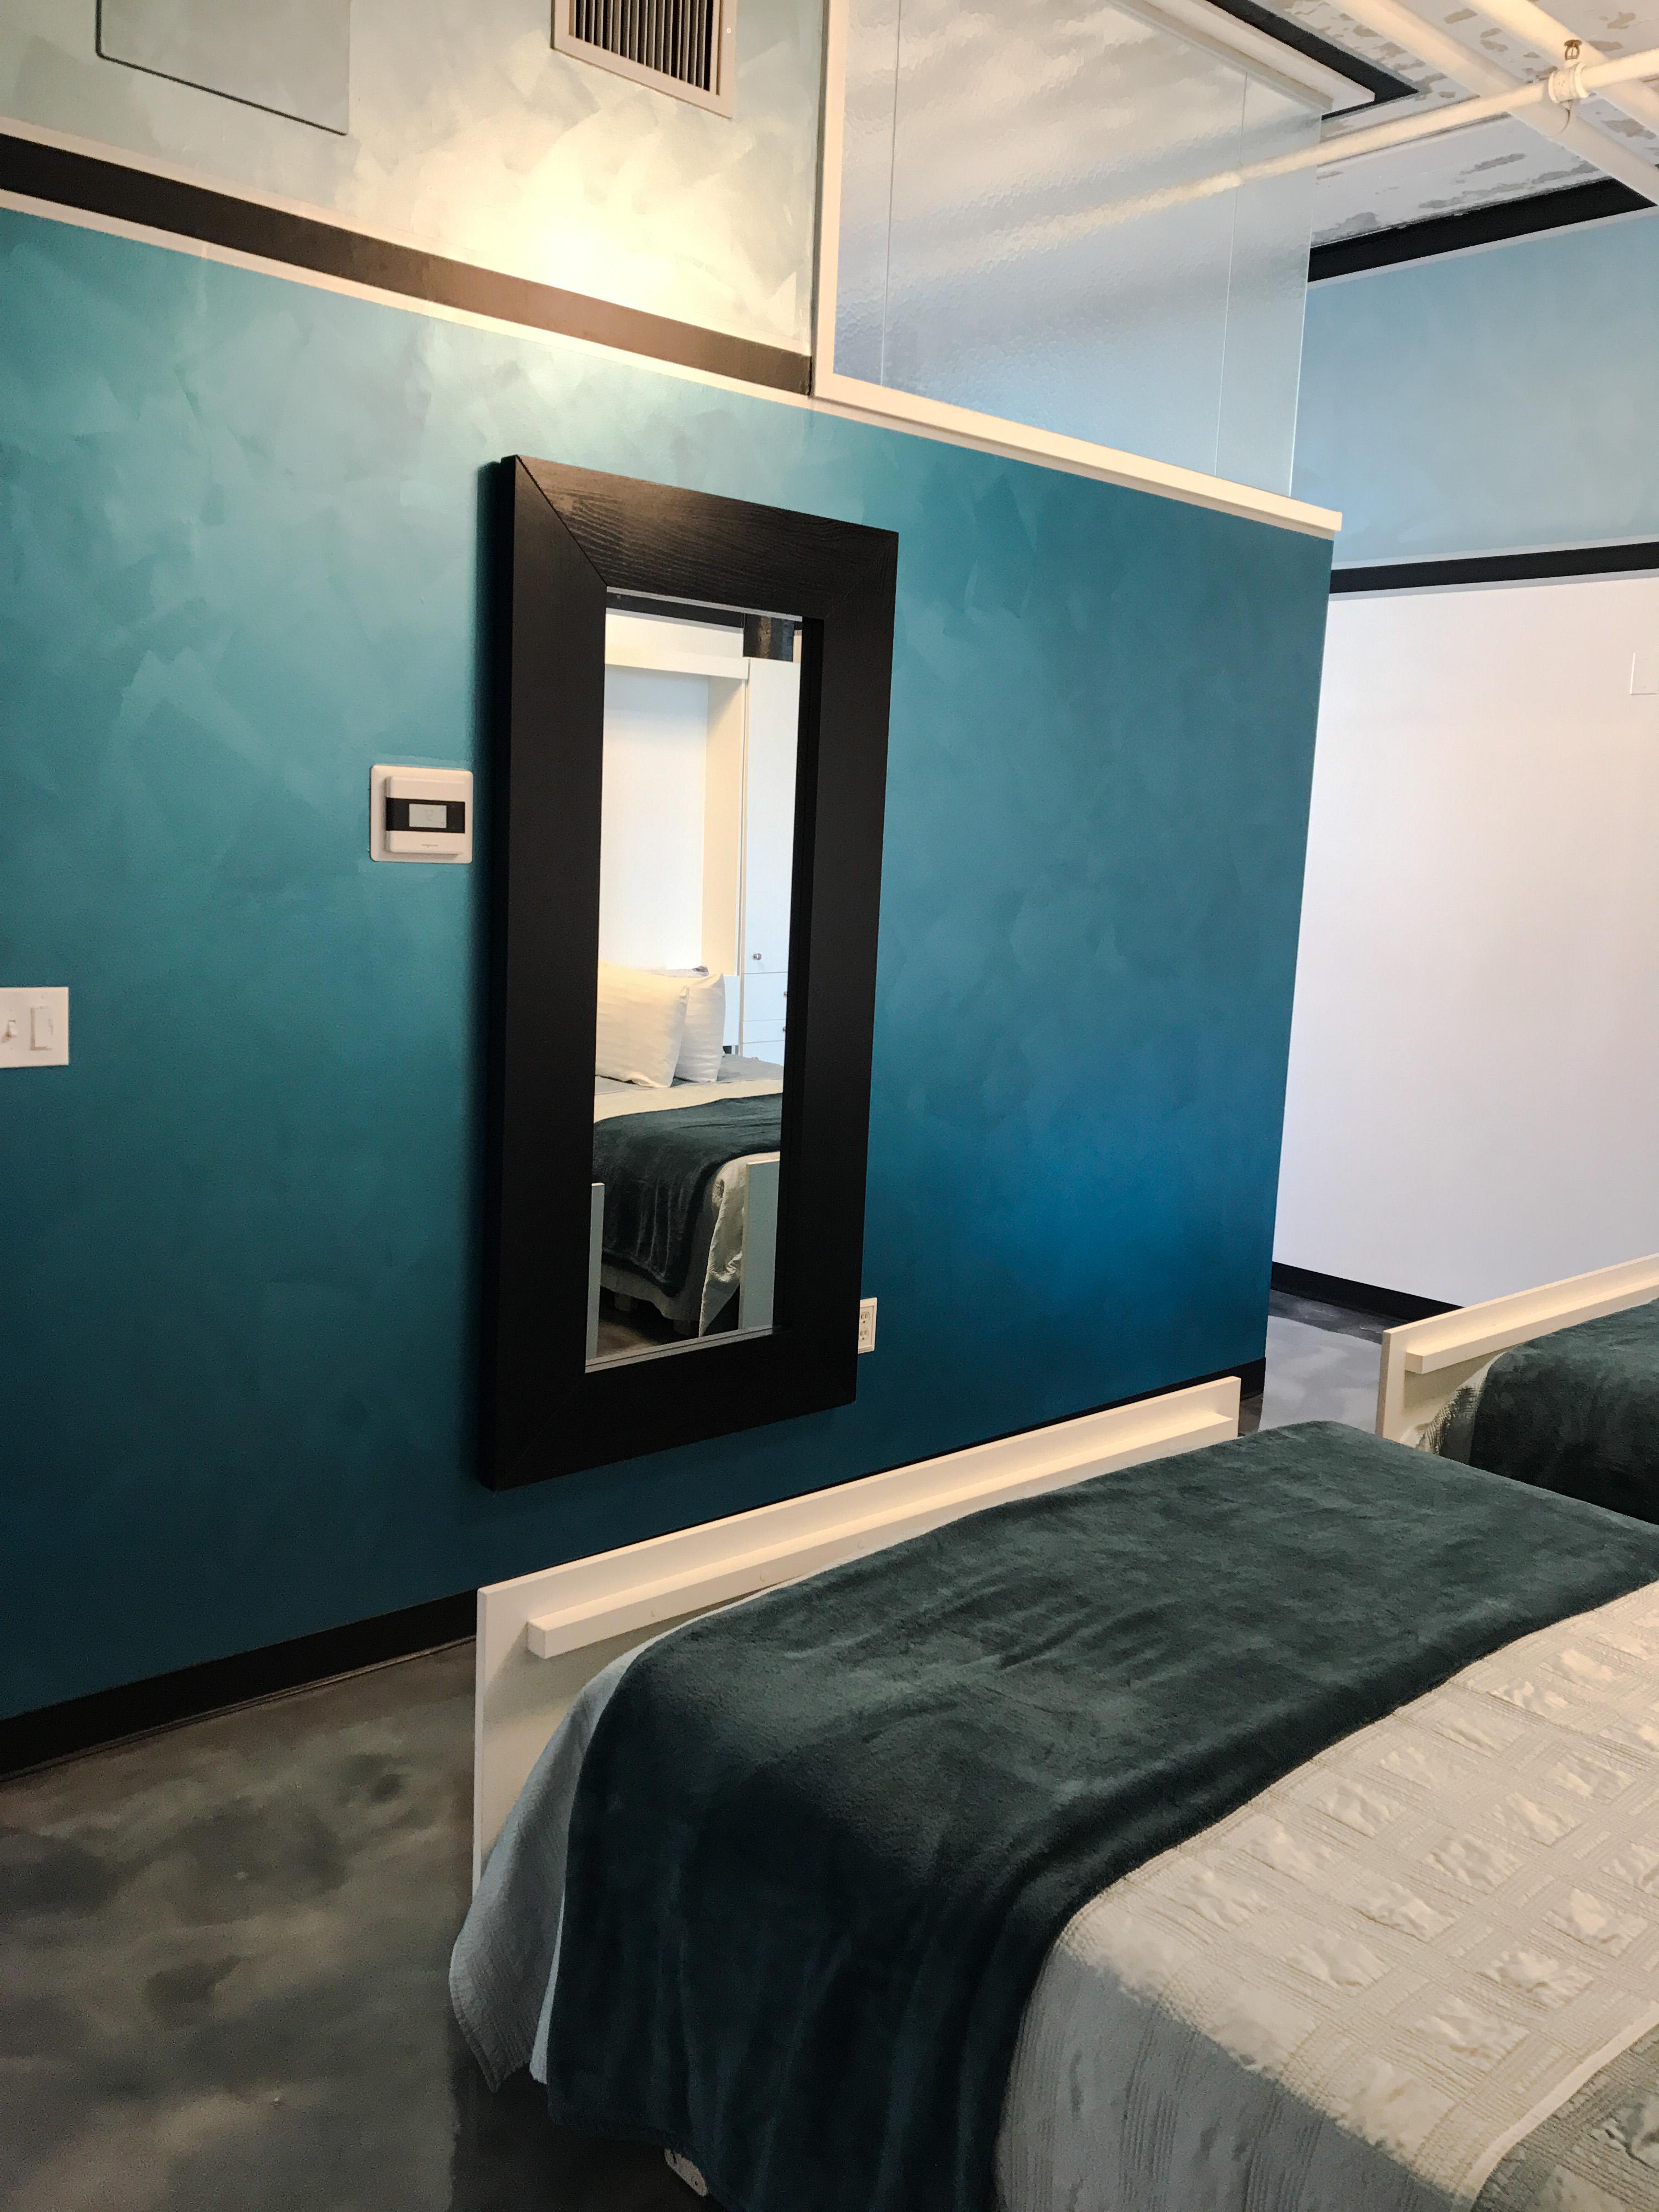 Loft Reverie Hotel - Loft 711 - Beds + Mirror